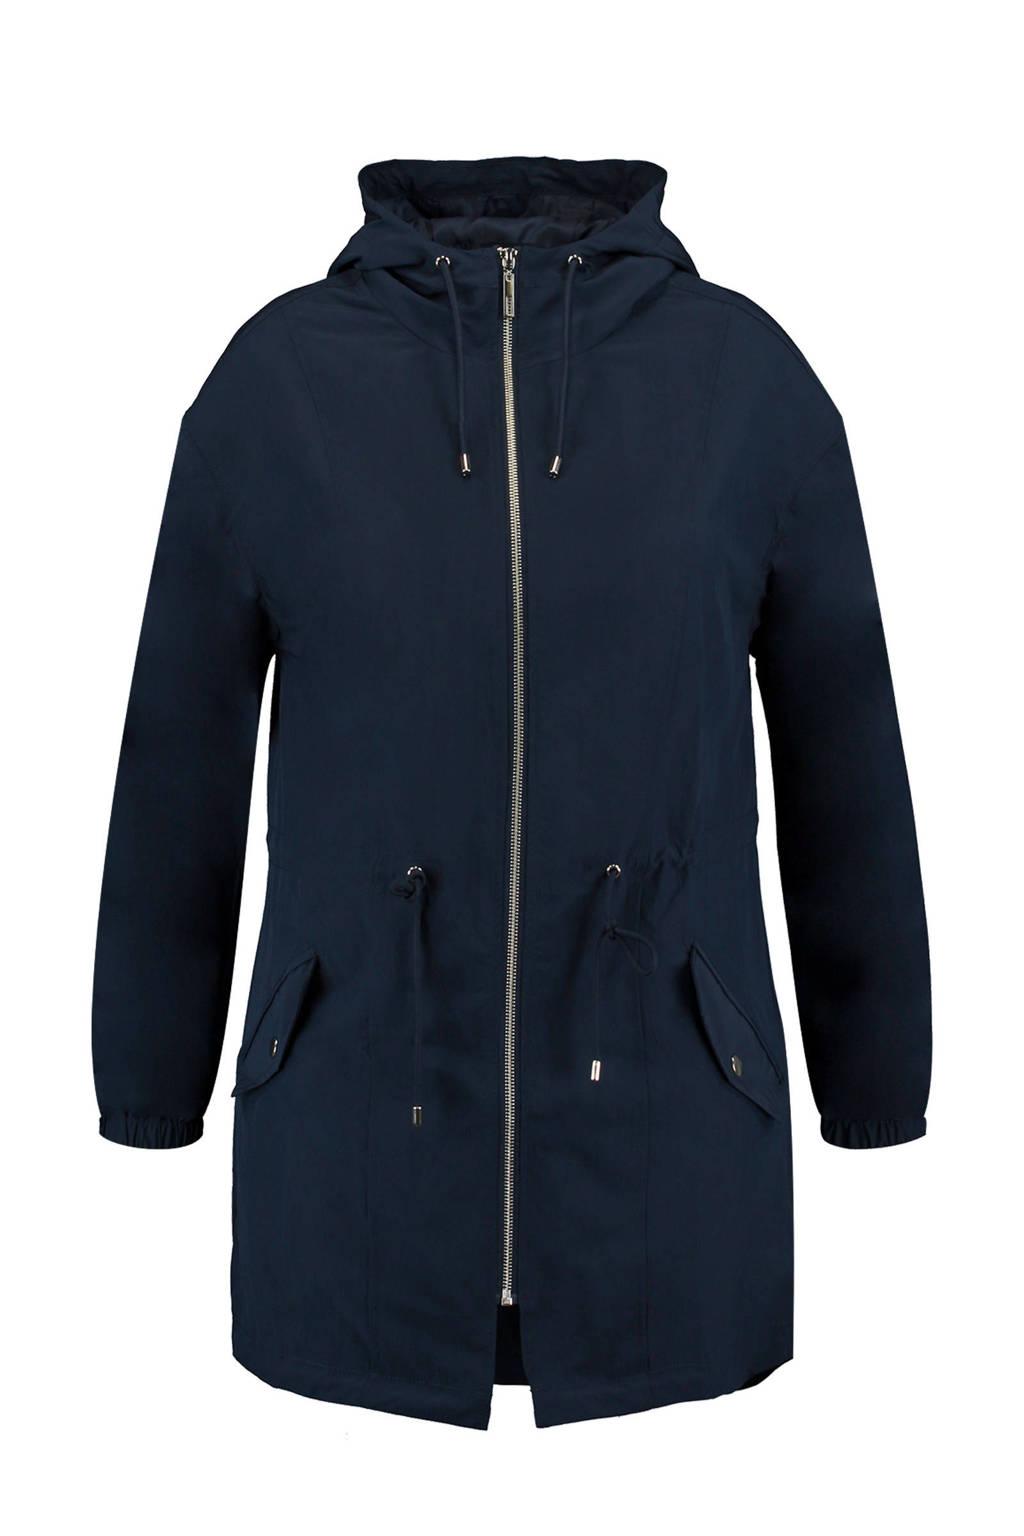 MS Mode jas blauw, Blauw